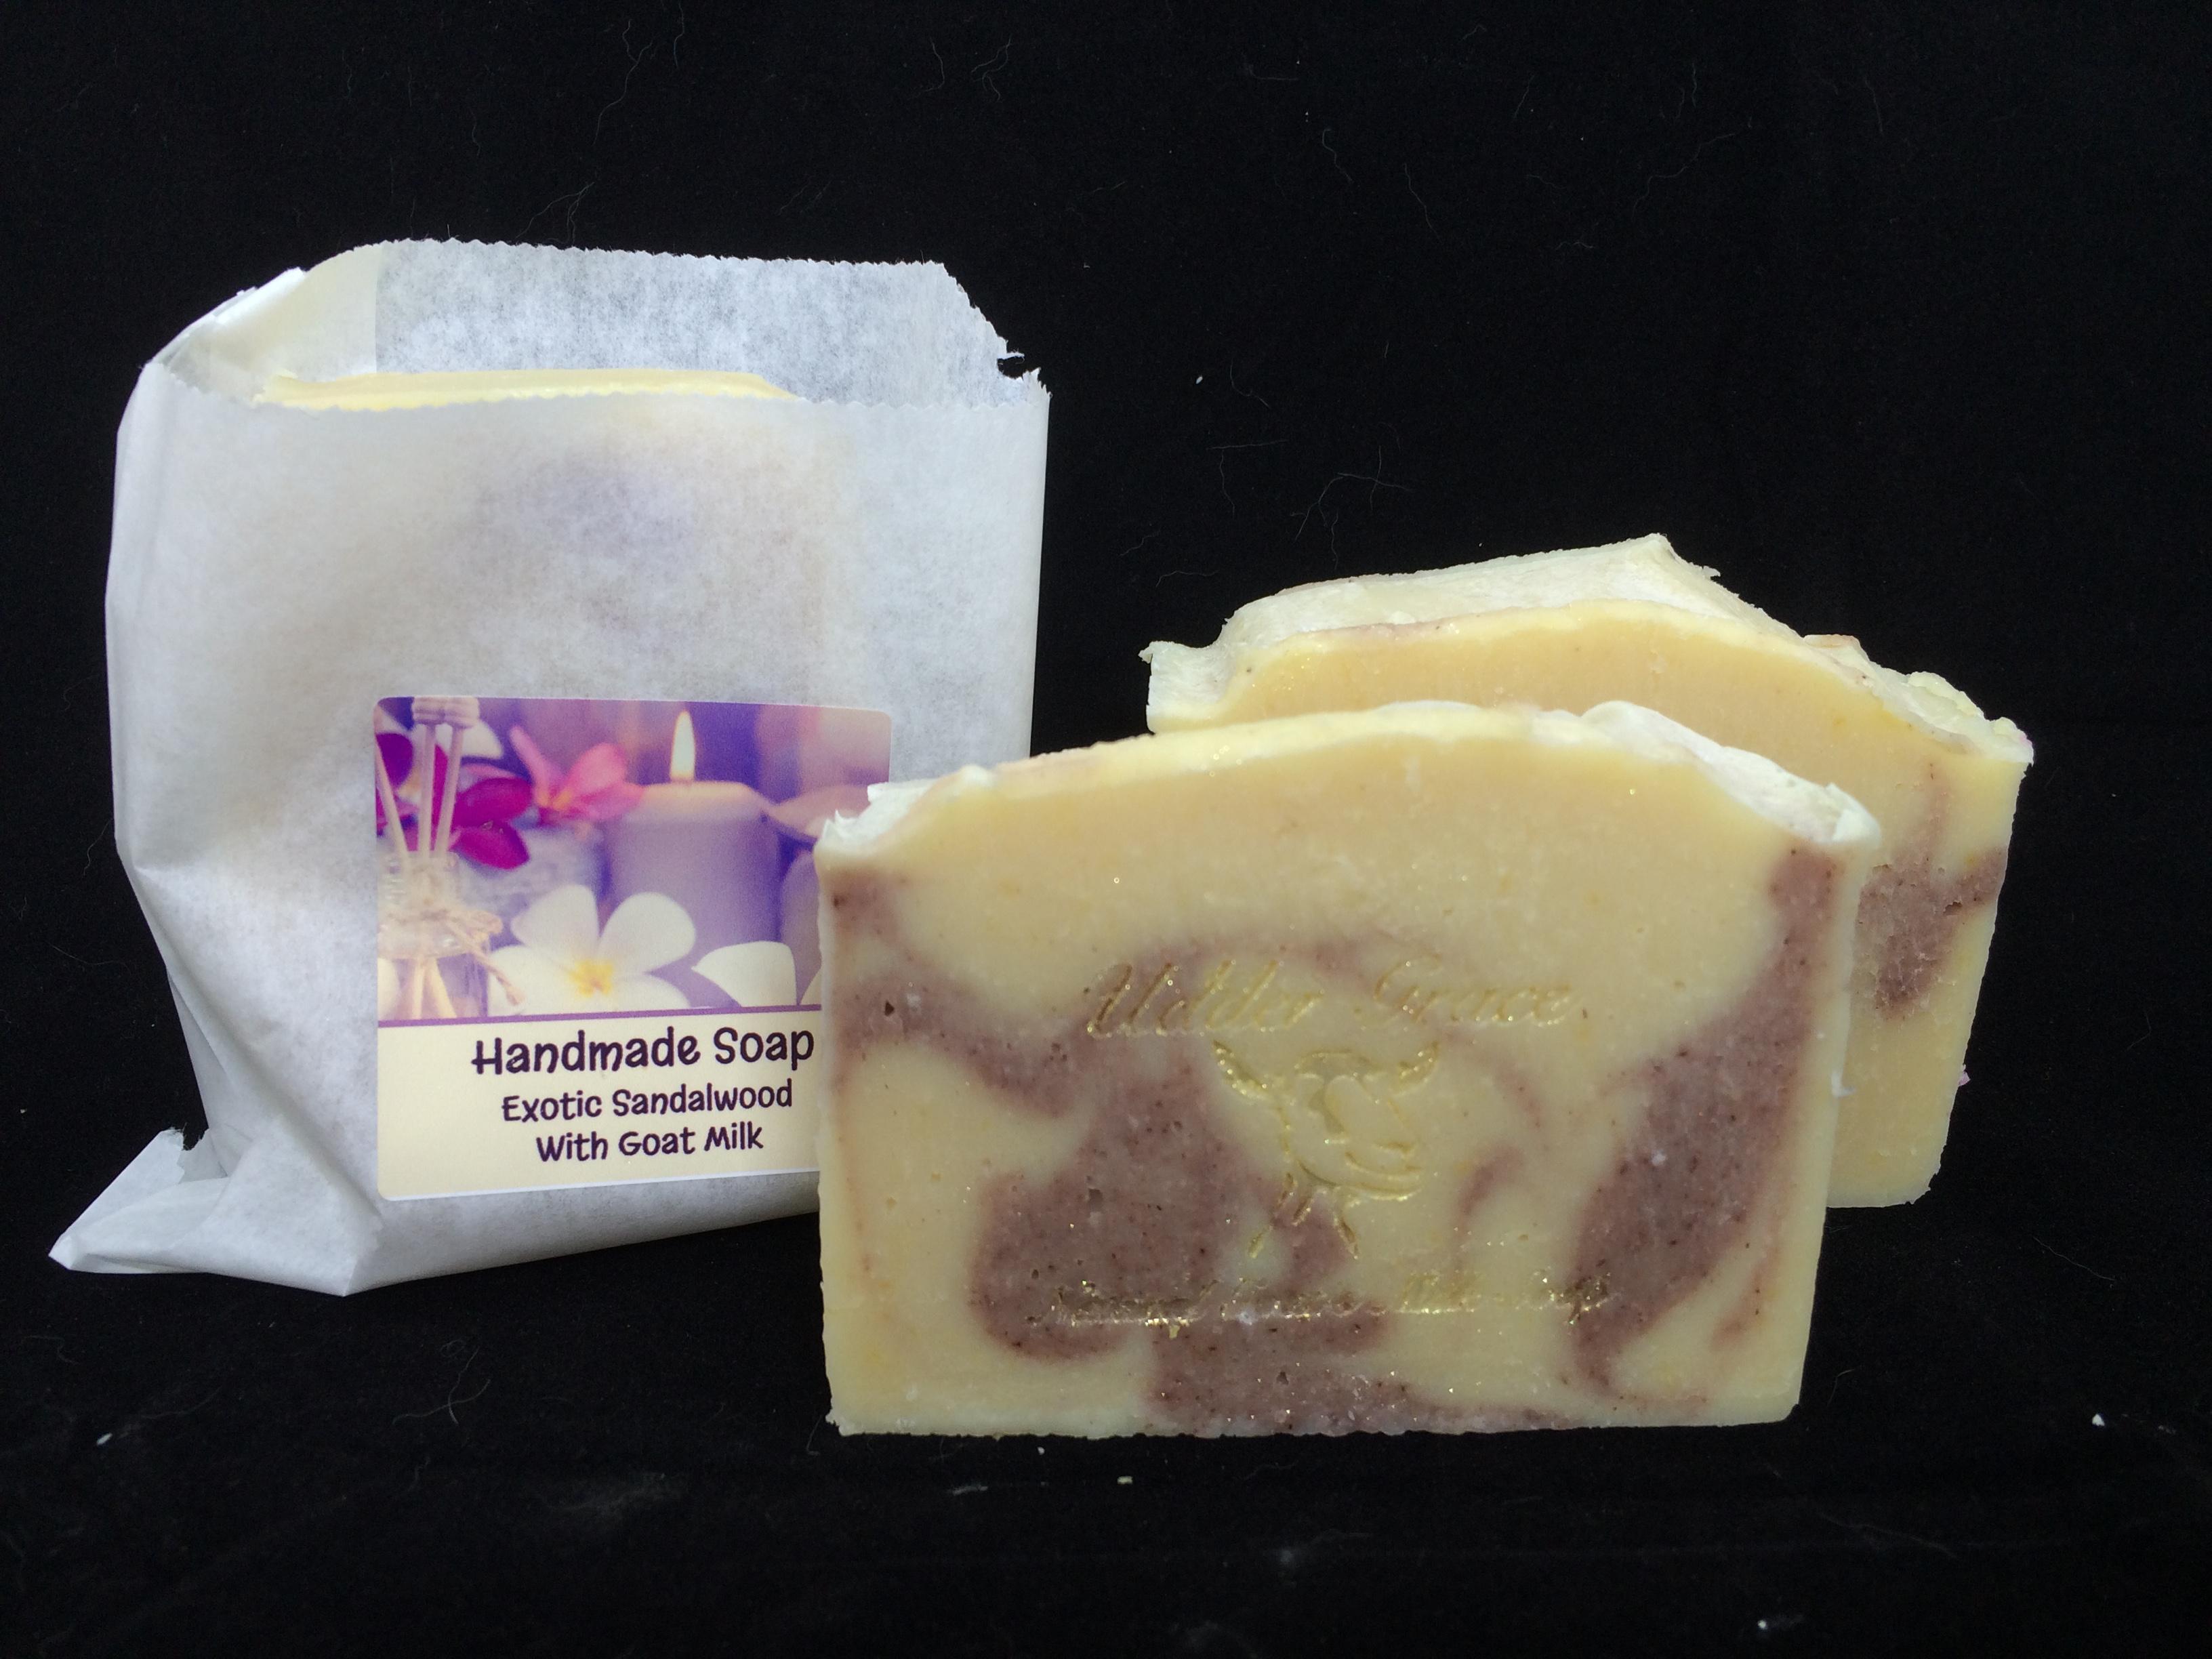 Sandalwood handmade soap with goat milk